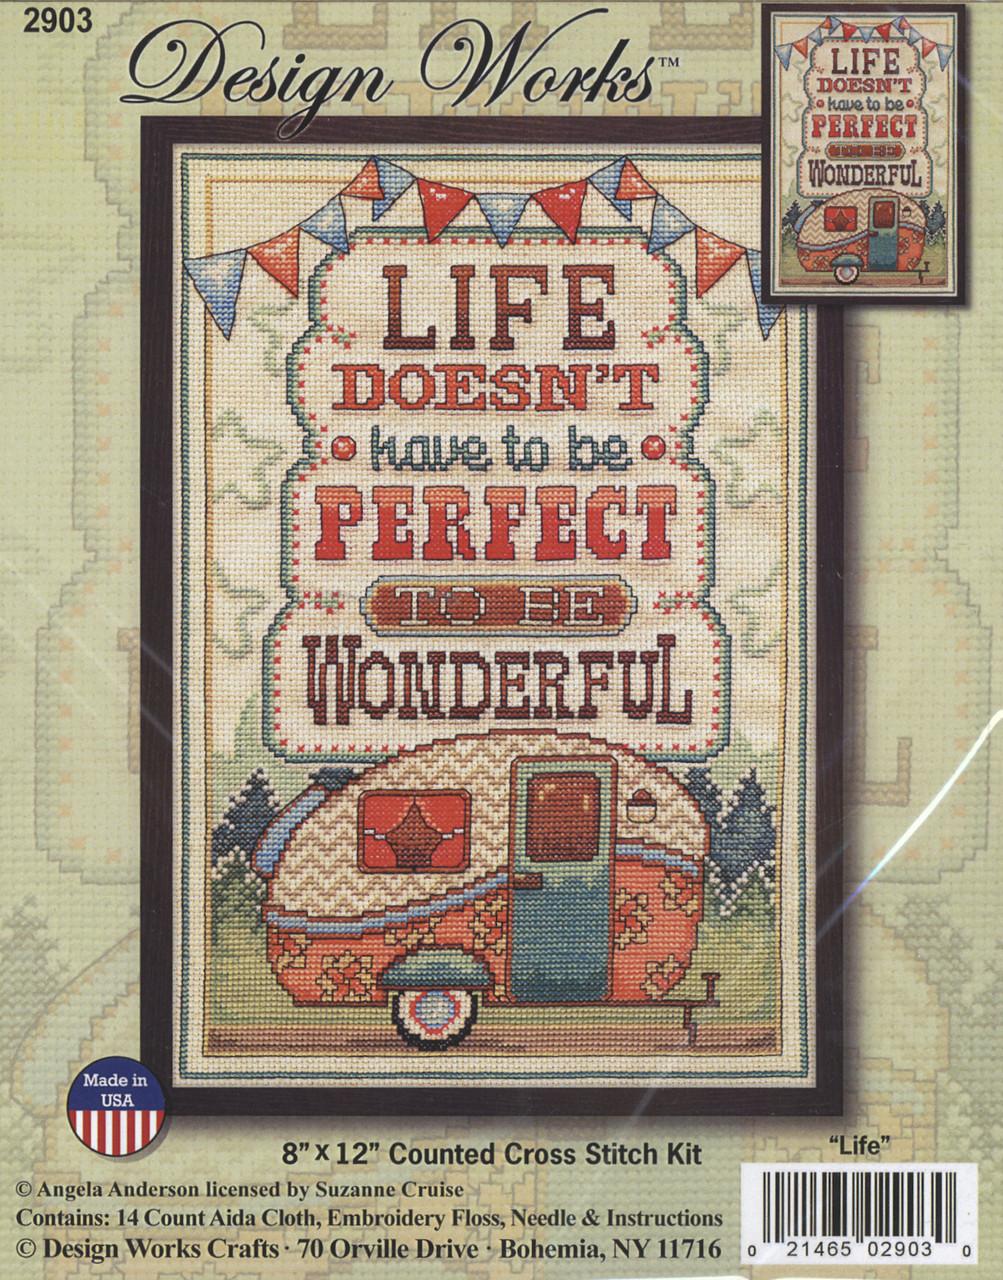 Design Works - Wonderful Life